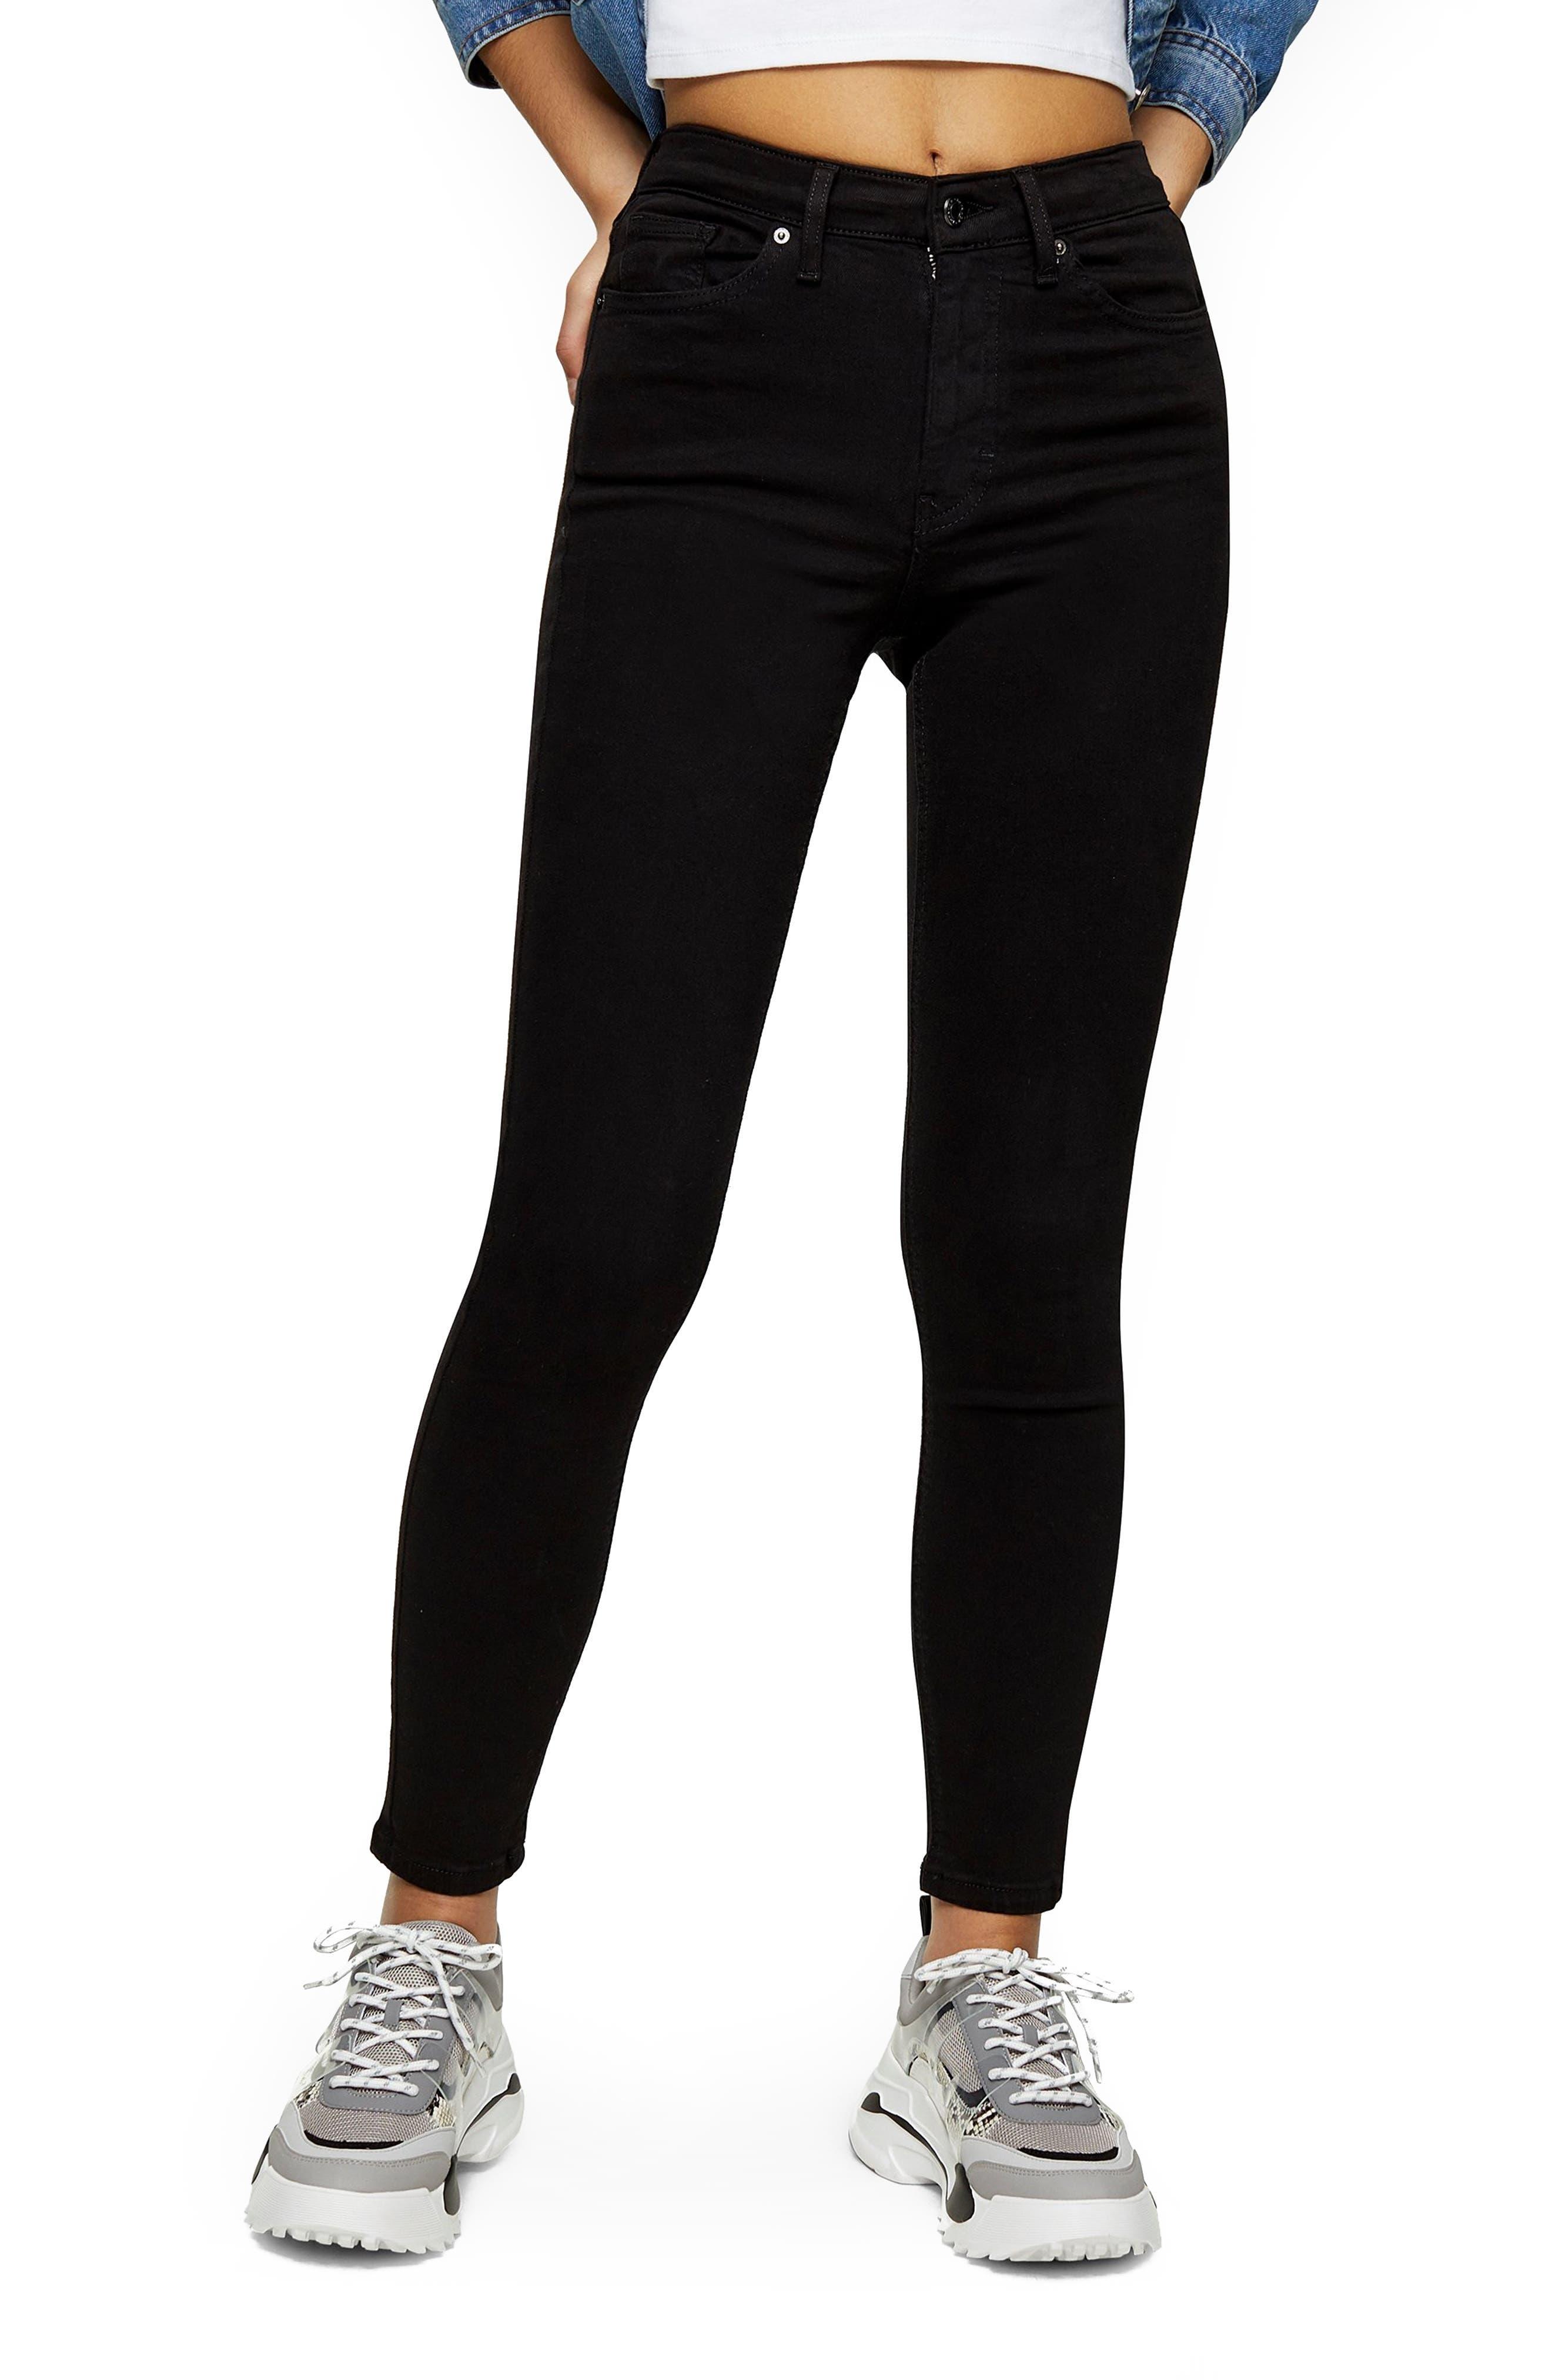 Women's Topshop Jamie High Waist Black Jeans,  36W x 32L (fits like 33-34W) - Black